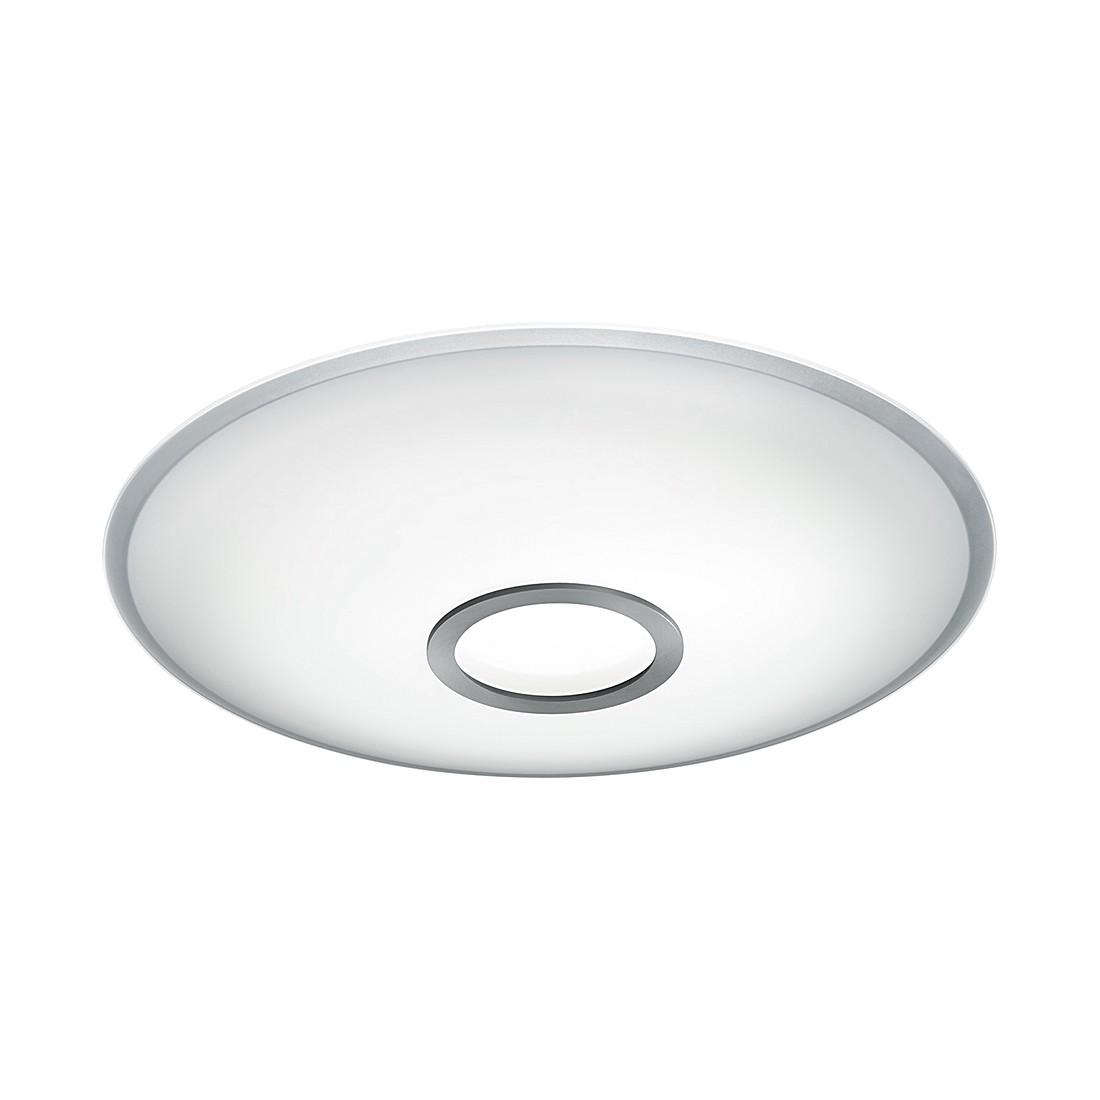 energie  A+, Plafondlamp NUNO - metaal/zilverkleurig glas, Helestra